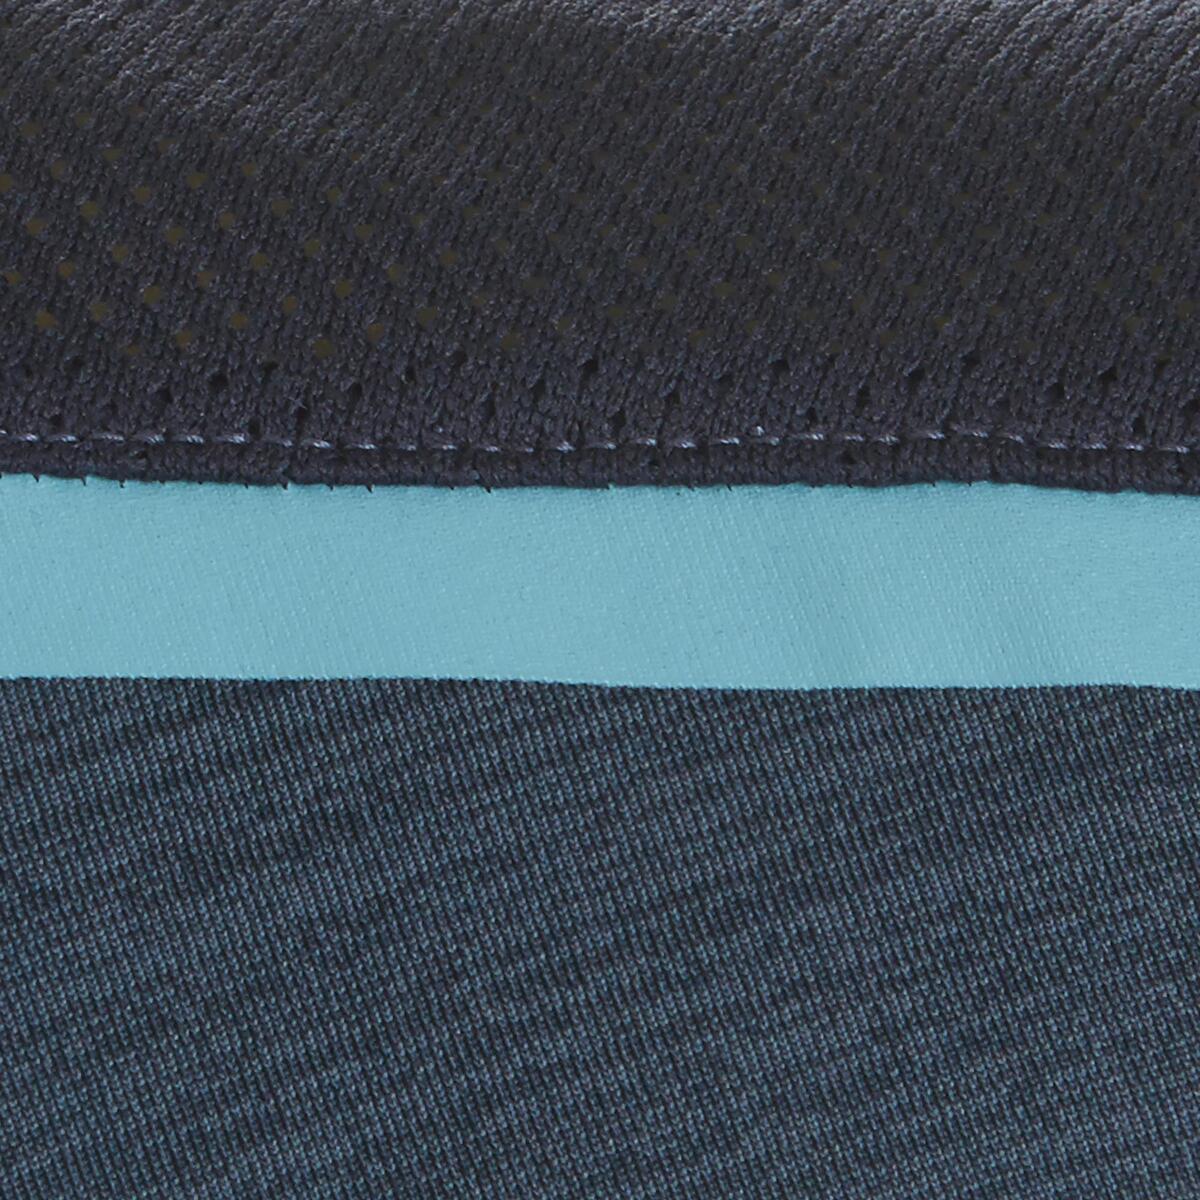 Bild 5 von T-Shirt Synthetik atmungsaktiv S500 Gym Kinder dunkelblau